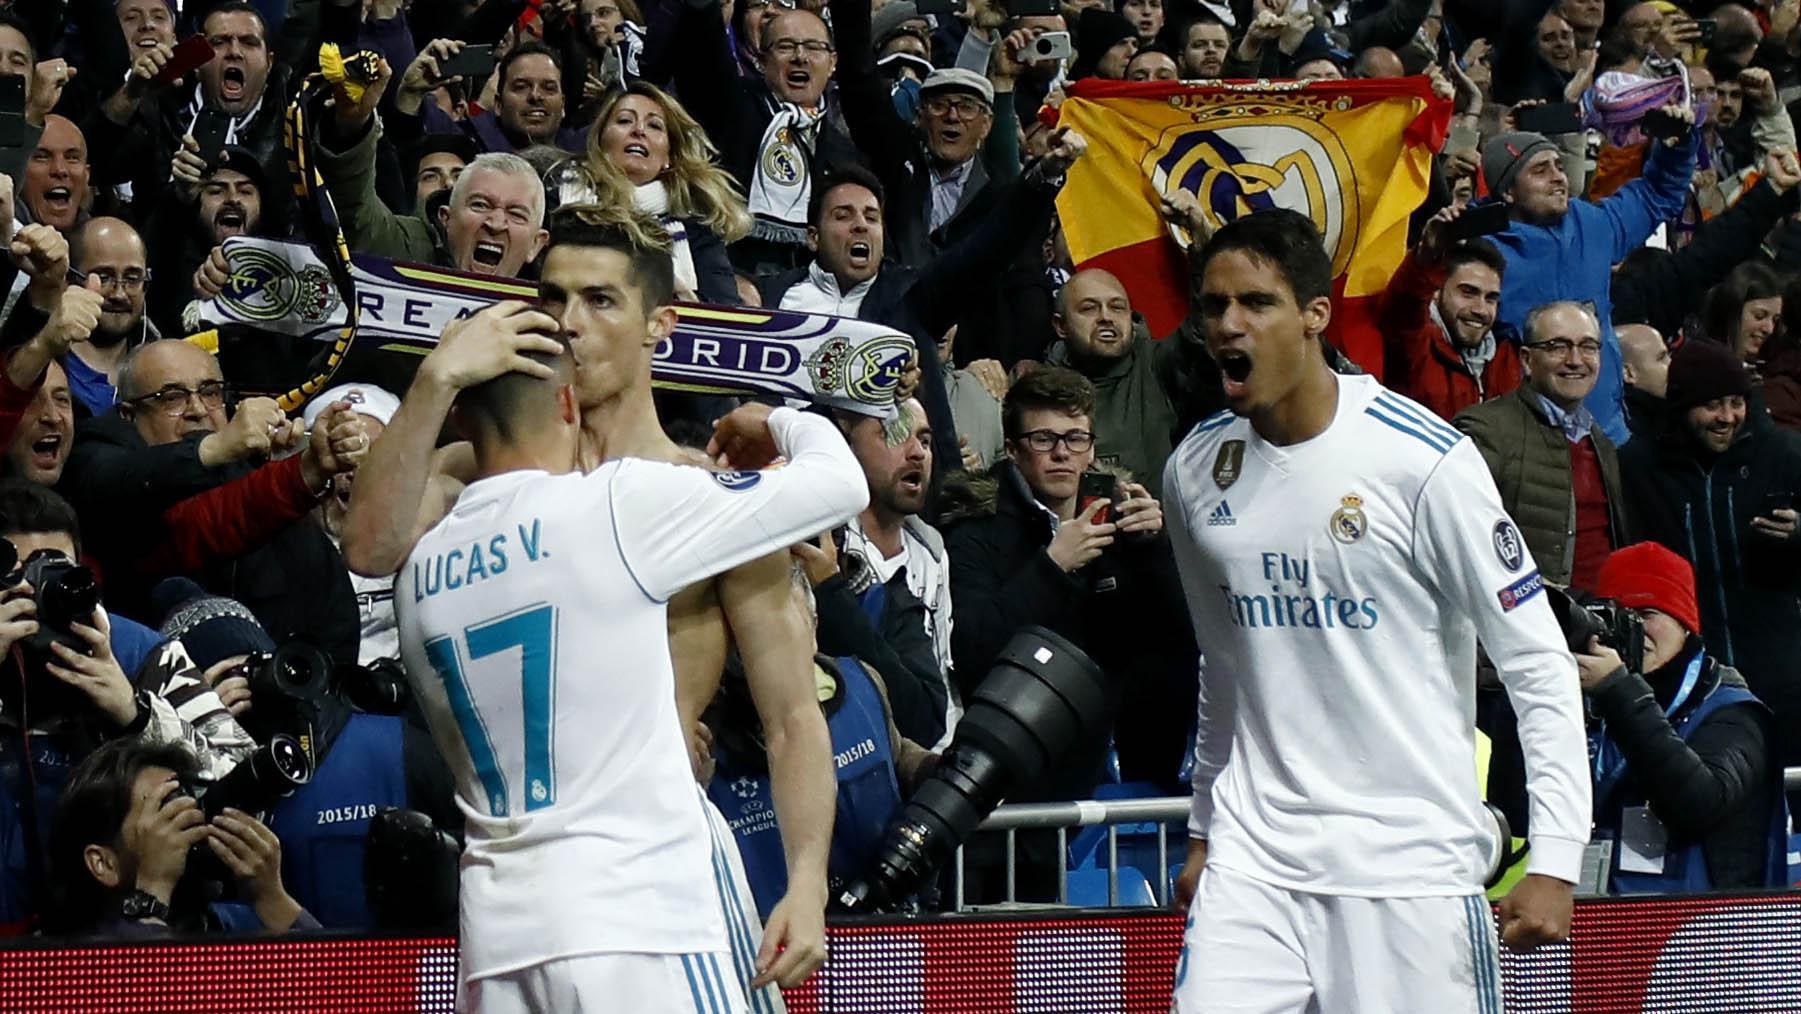 Striker Real Madrid, Cristiano Ronaldo, melakukan selebrasi bersama Lucas Vazquez usai mencetak gol ke gawang Juventus pada laga Liga Champions di Stadion Santiago Bernabeu, Rabu (11/4/2018) (AFP/Oscar Del Pozo)